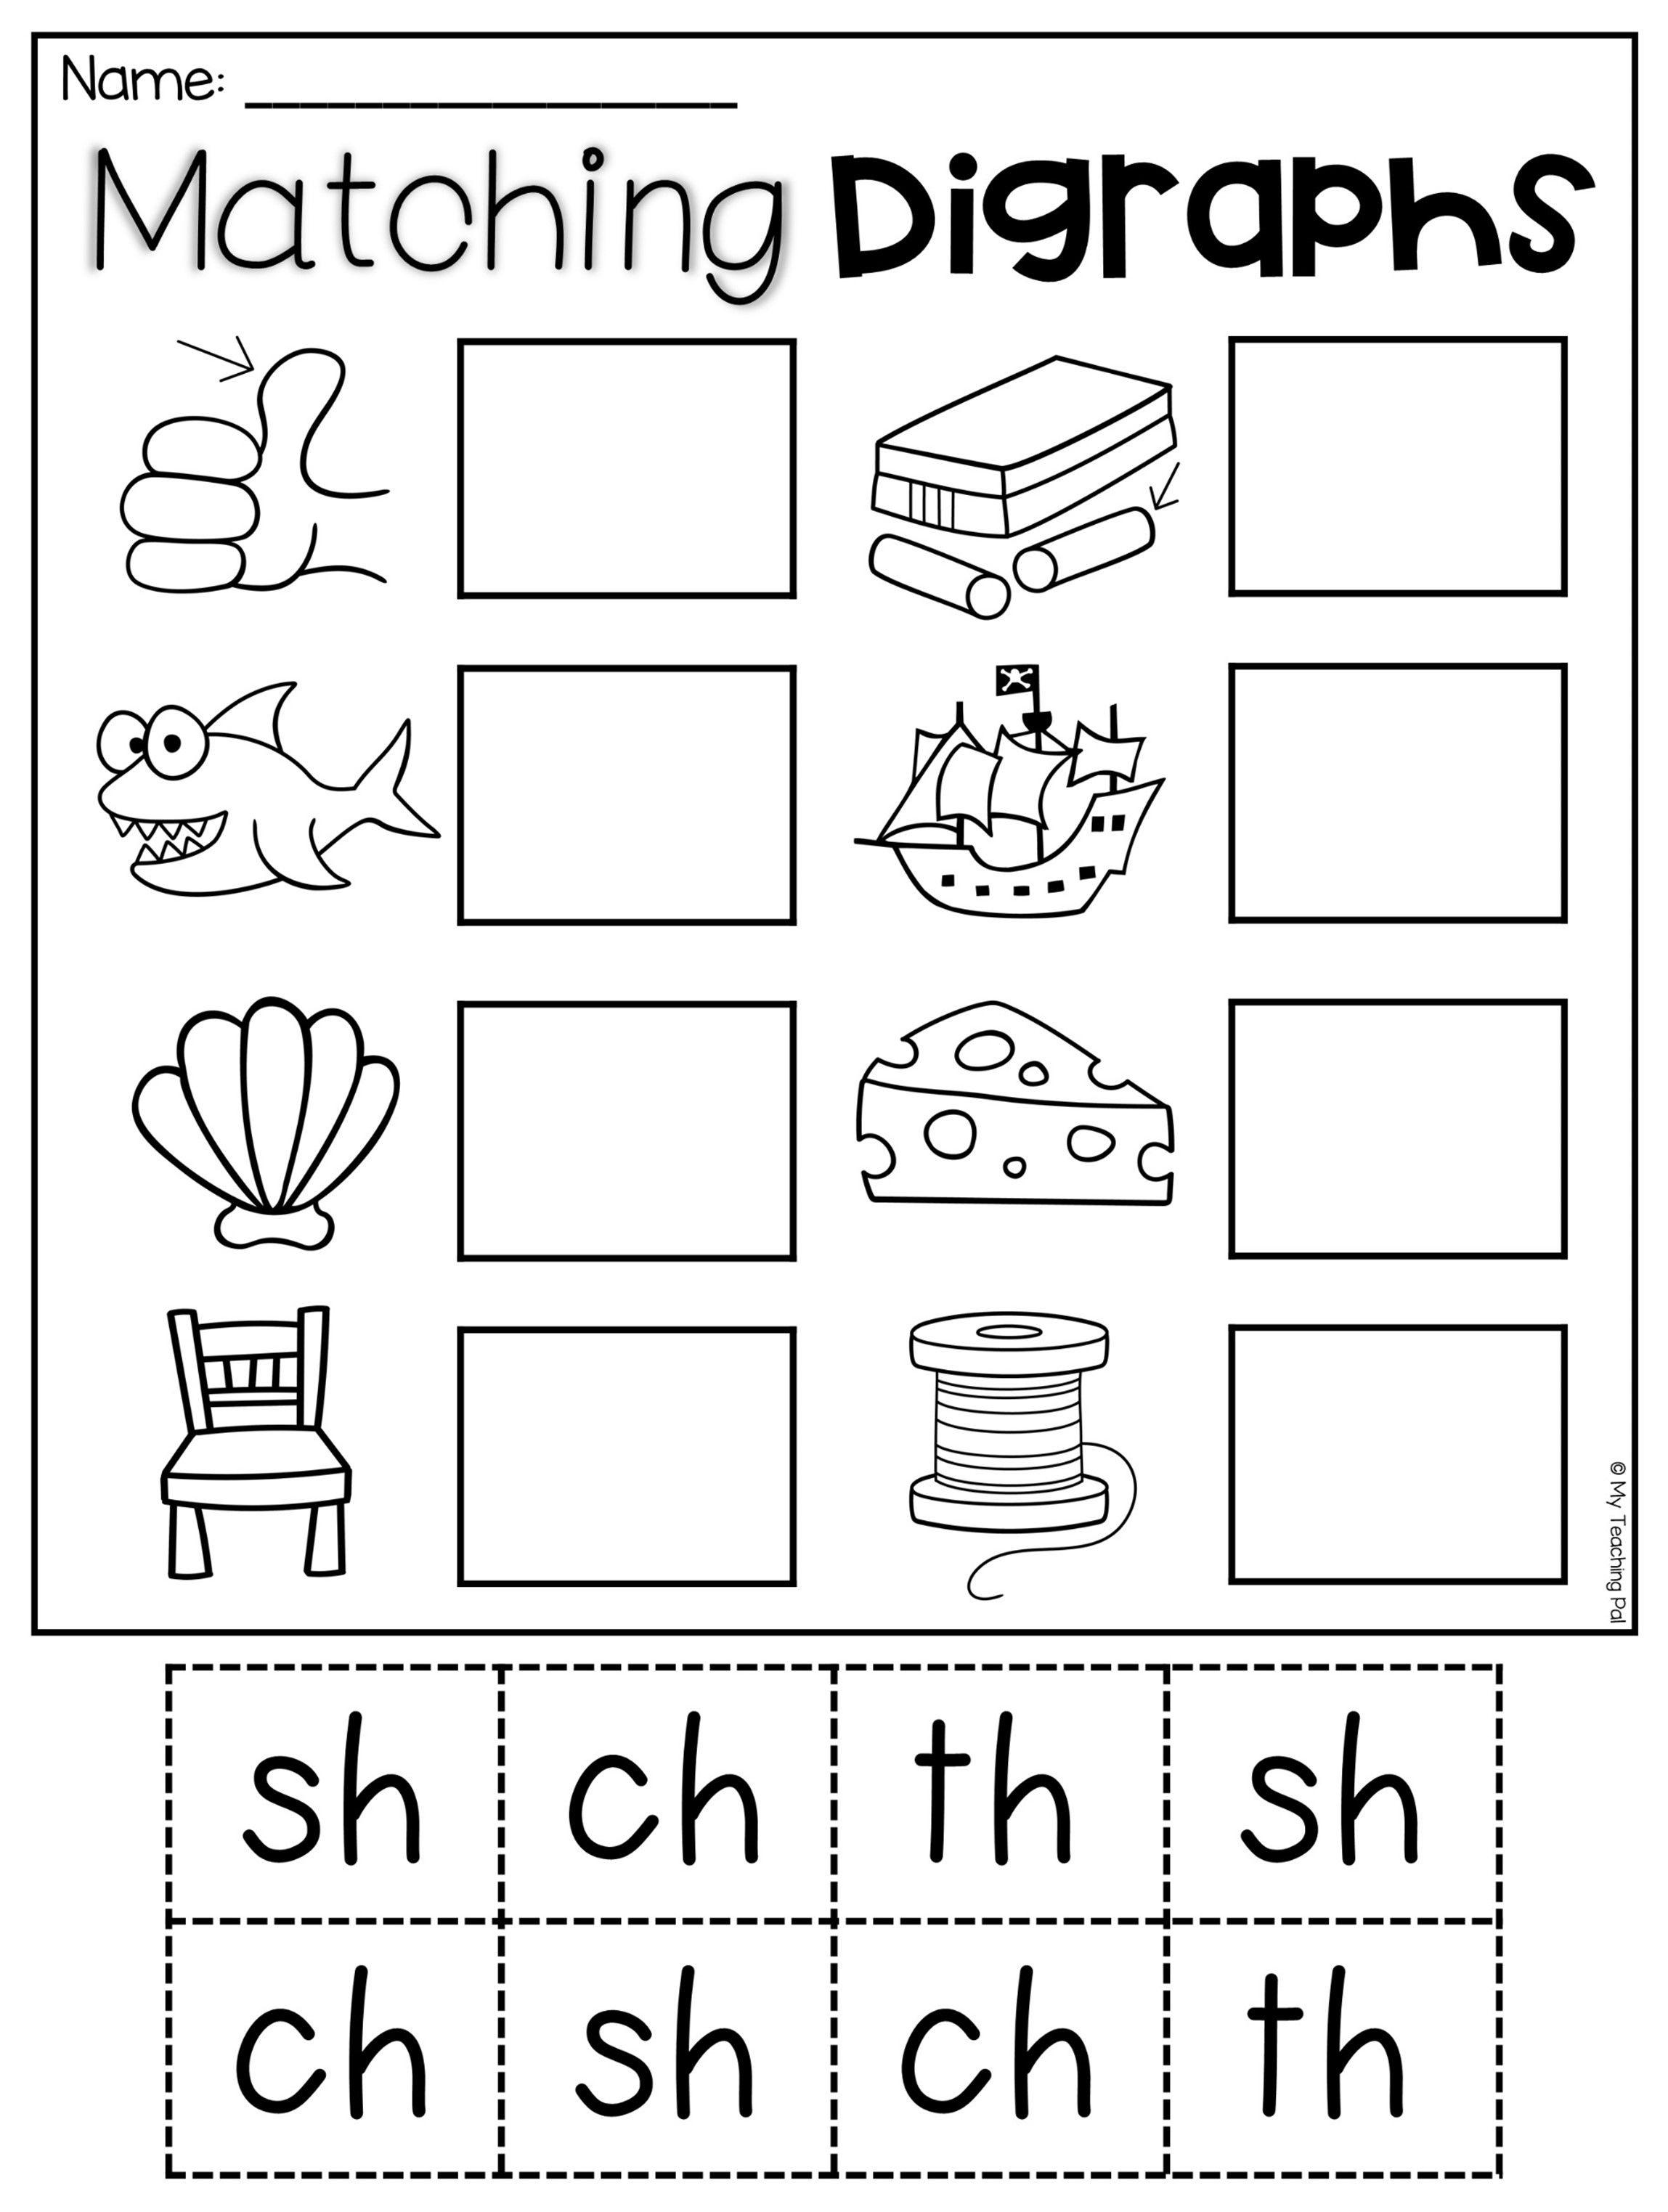 medium resolution of Matching digraphs worksheet for sh